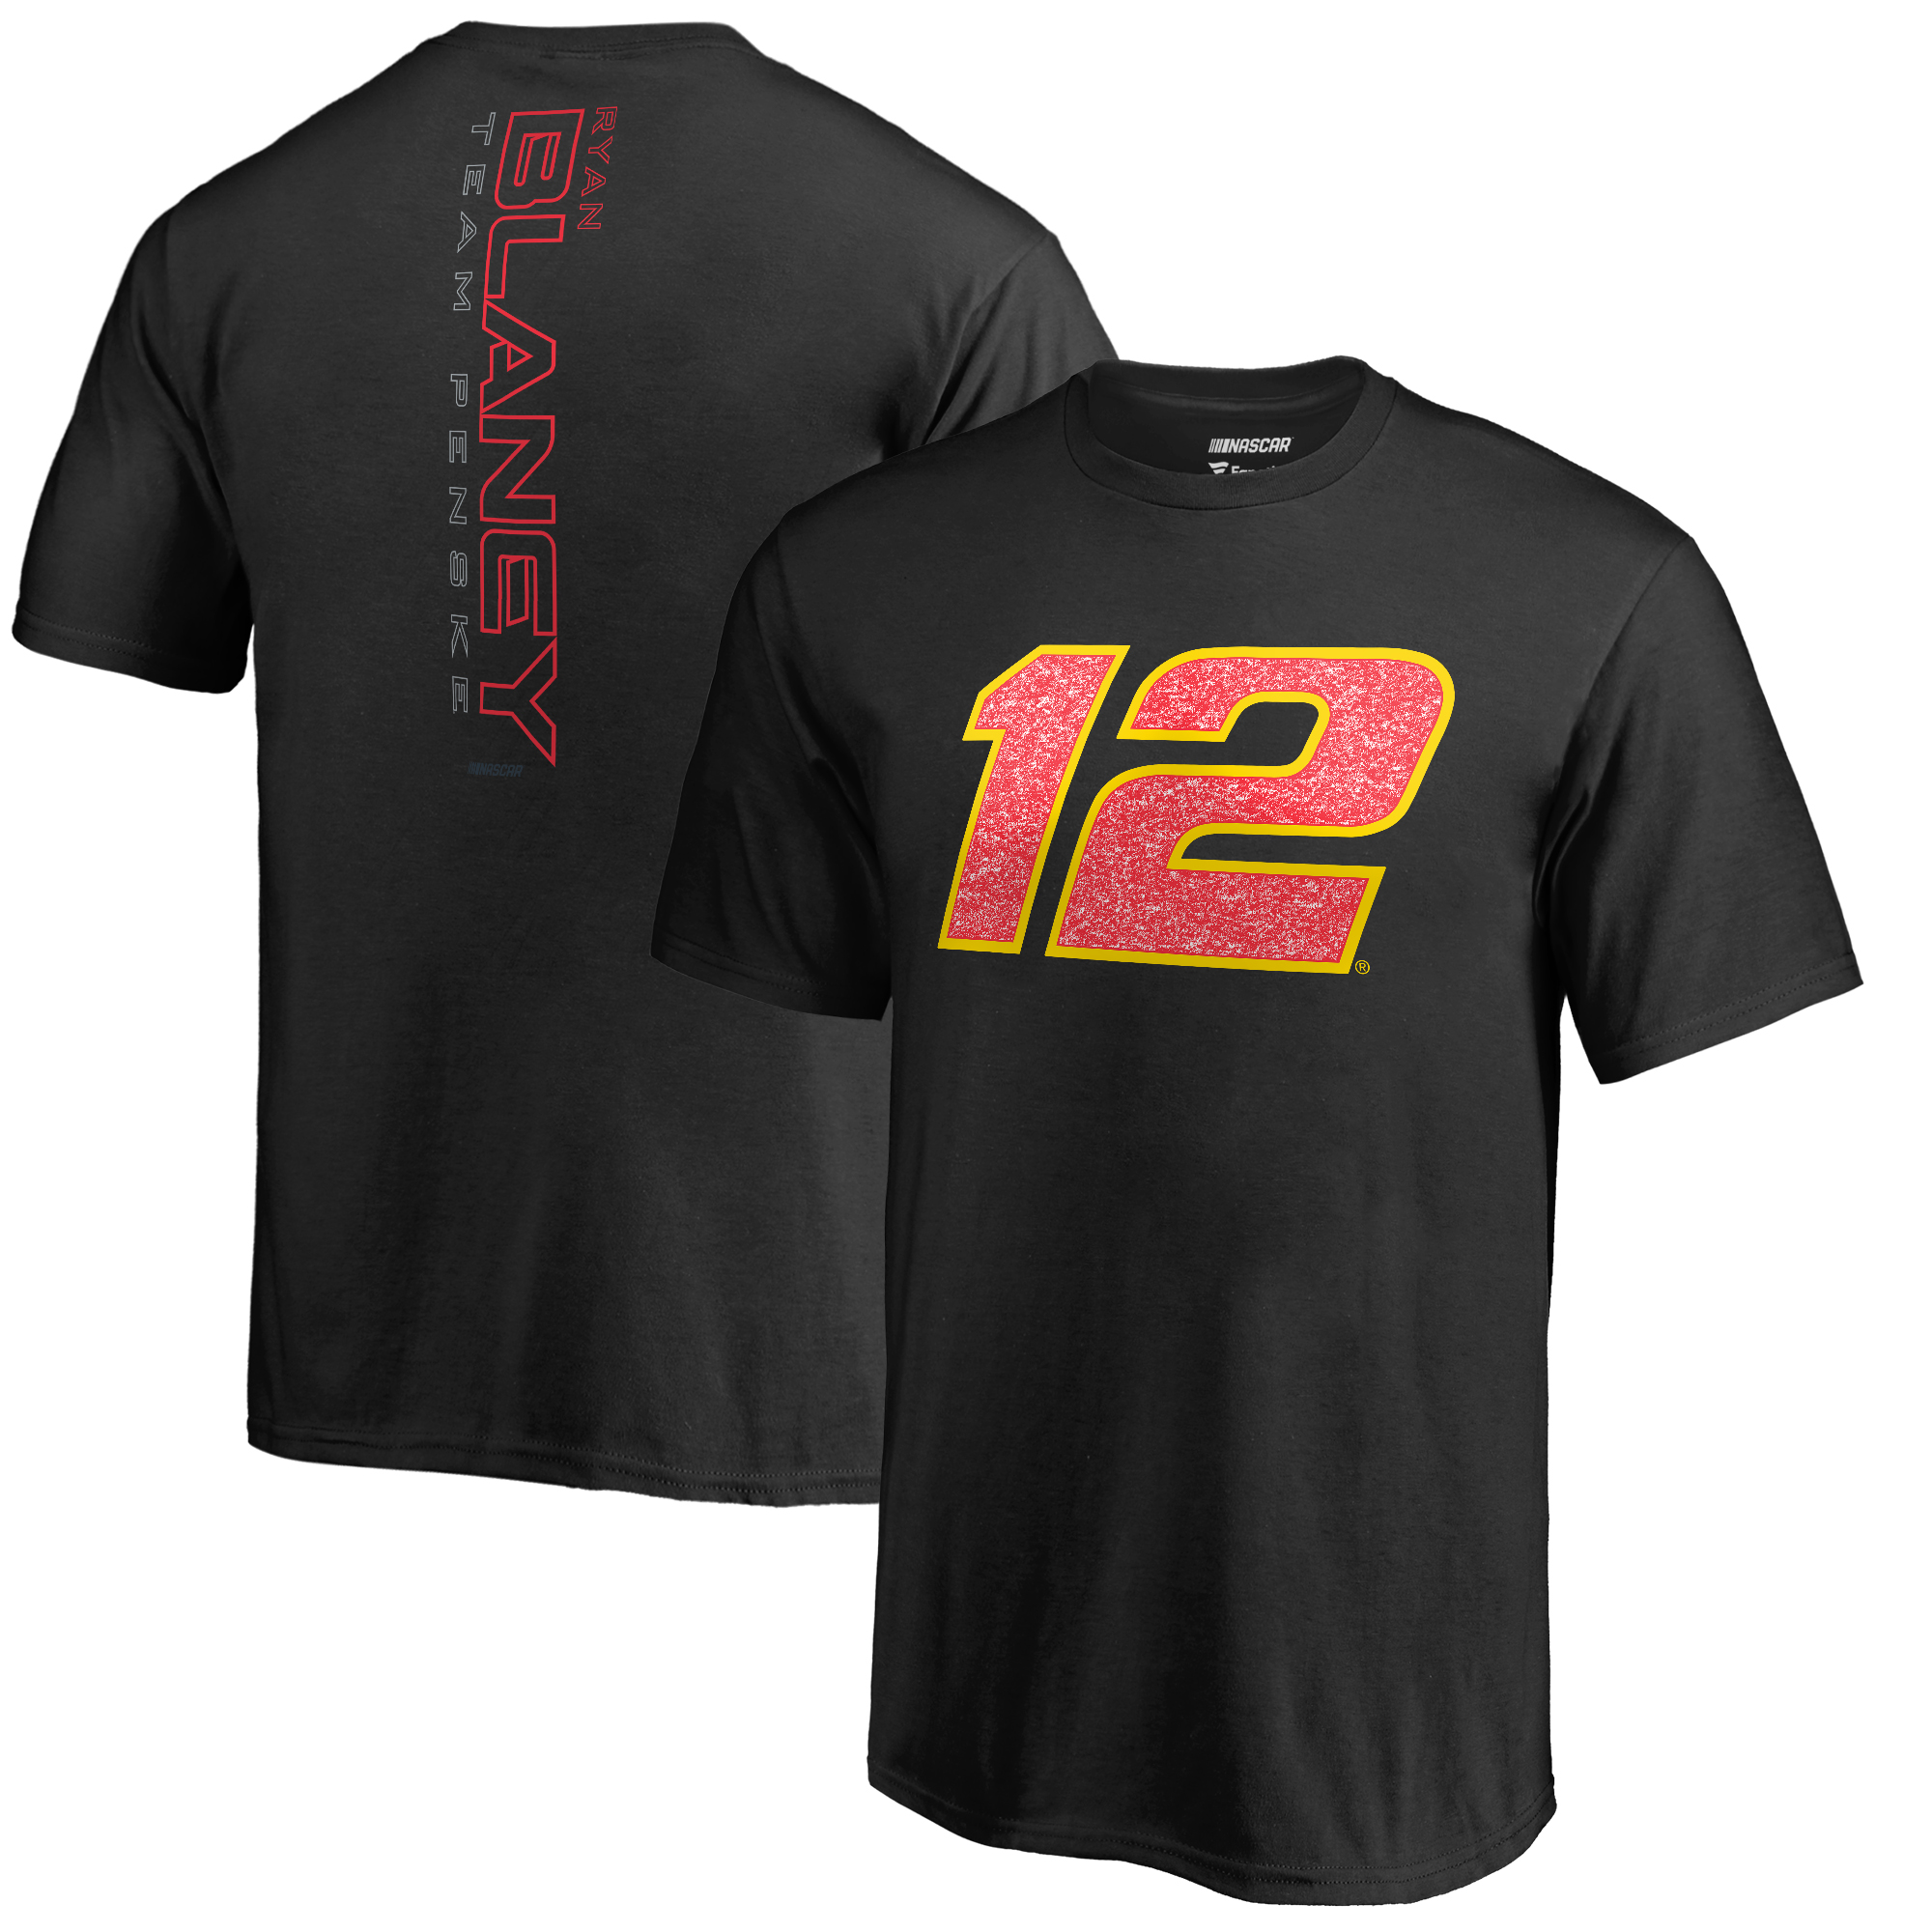 Ryan Blaney Fanatics Branded Youth Static T-Shirt - Black